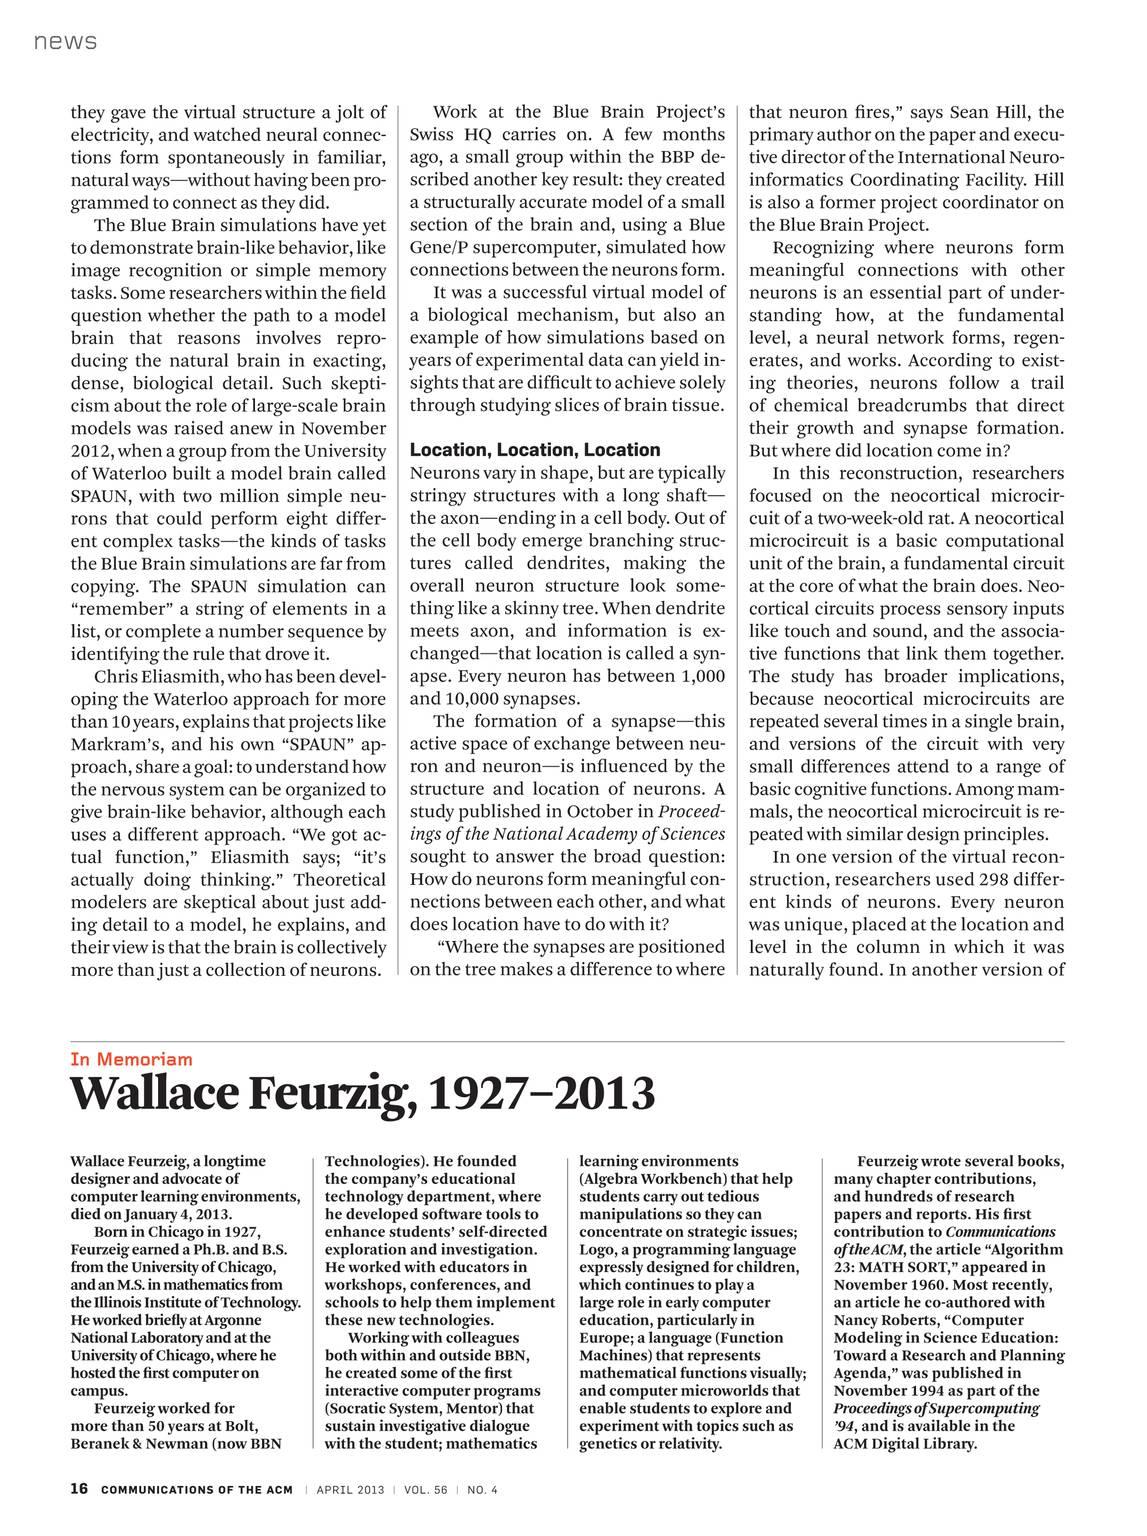 Communications - April 2013 - page 15